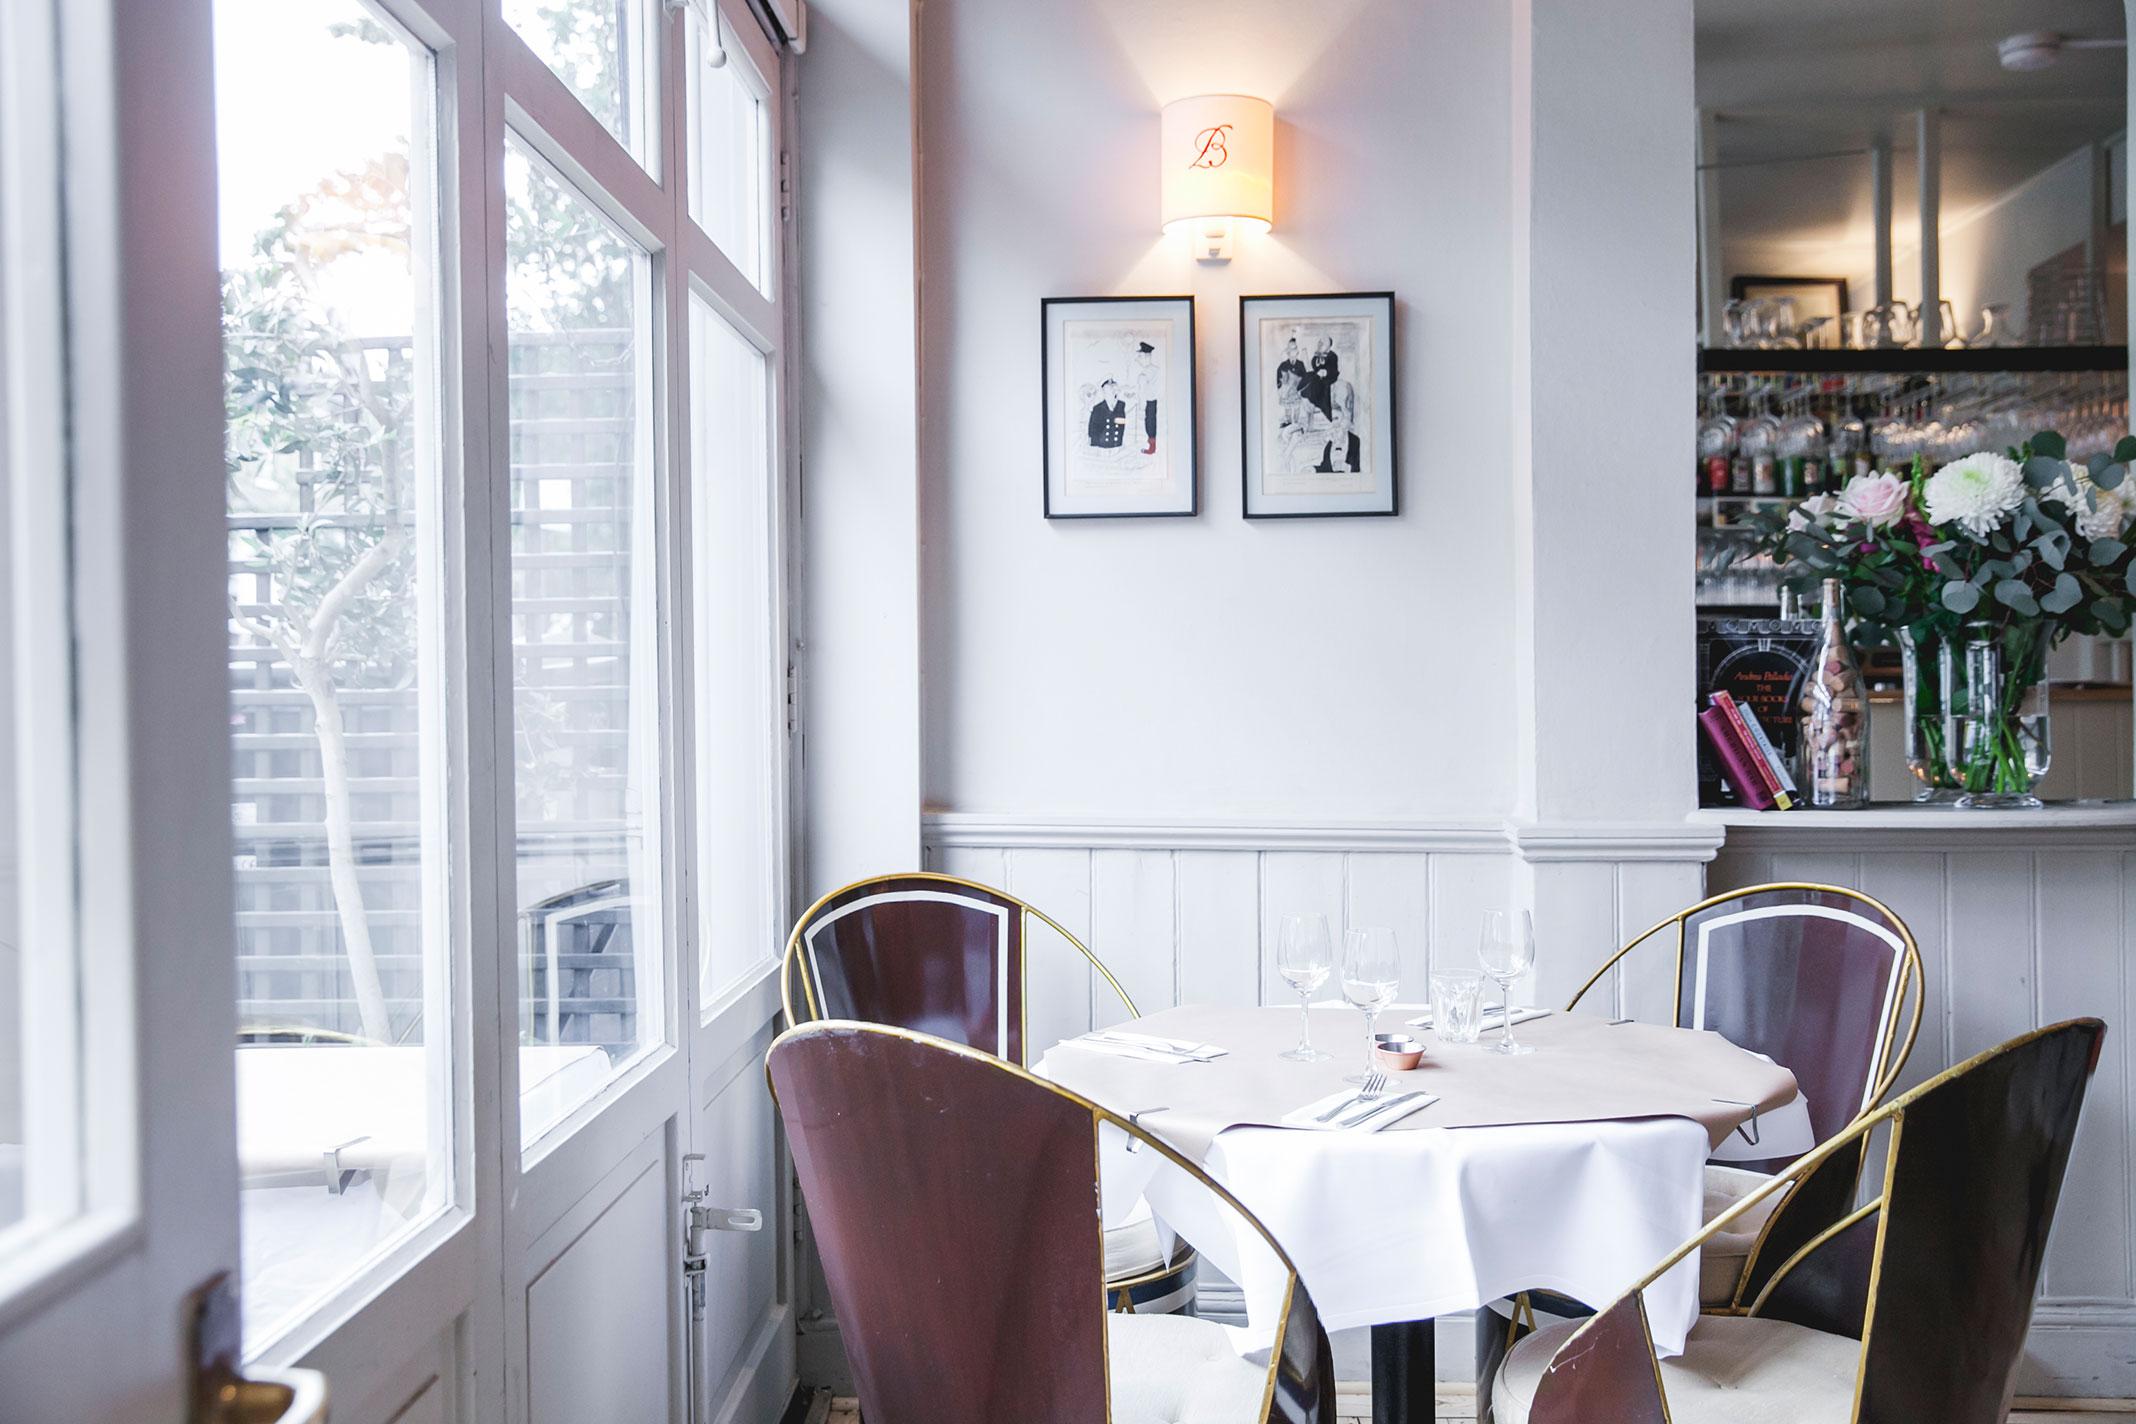 Restaurant review: The Brackenbury